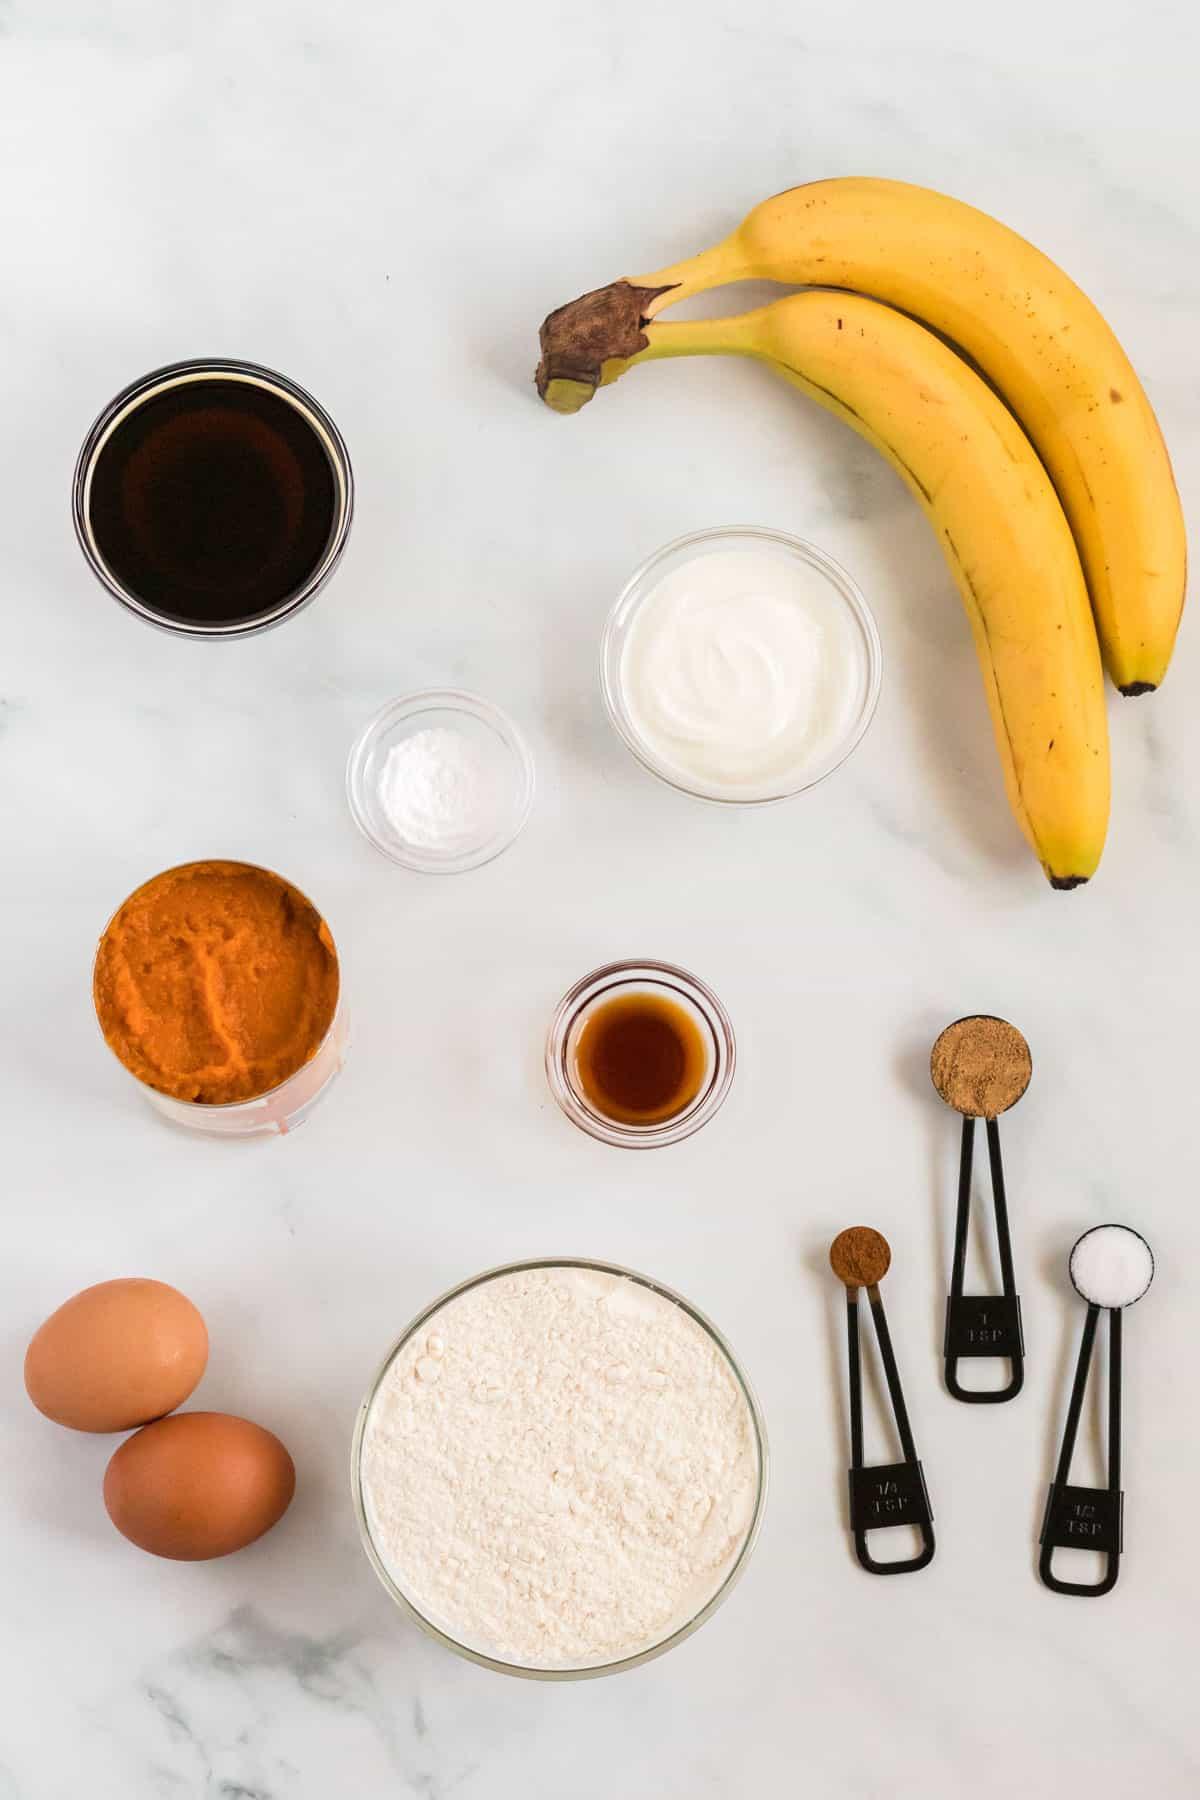 ingredients to make pumpkin banana bread